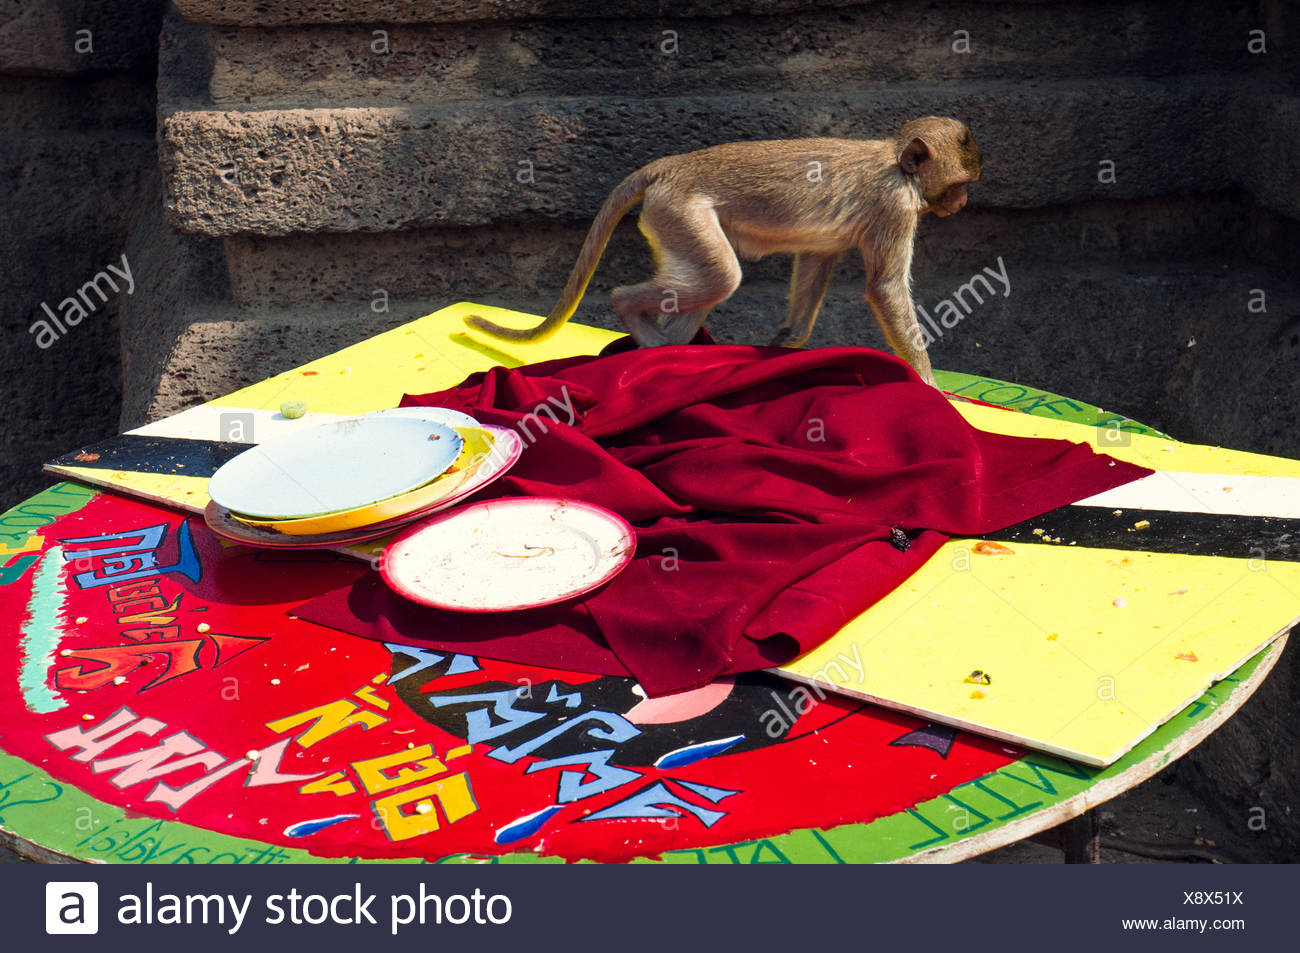 Monkey On Table - Stock Image